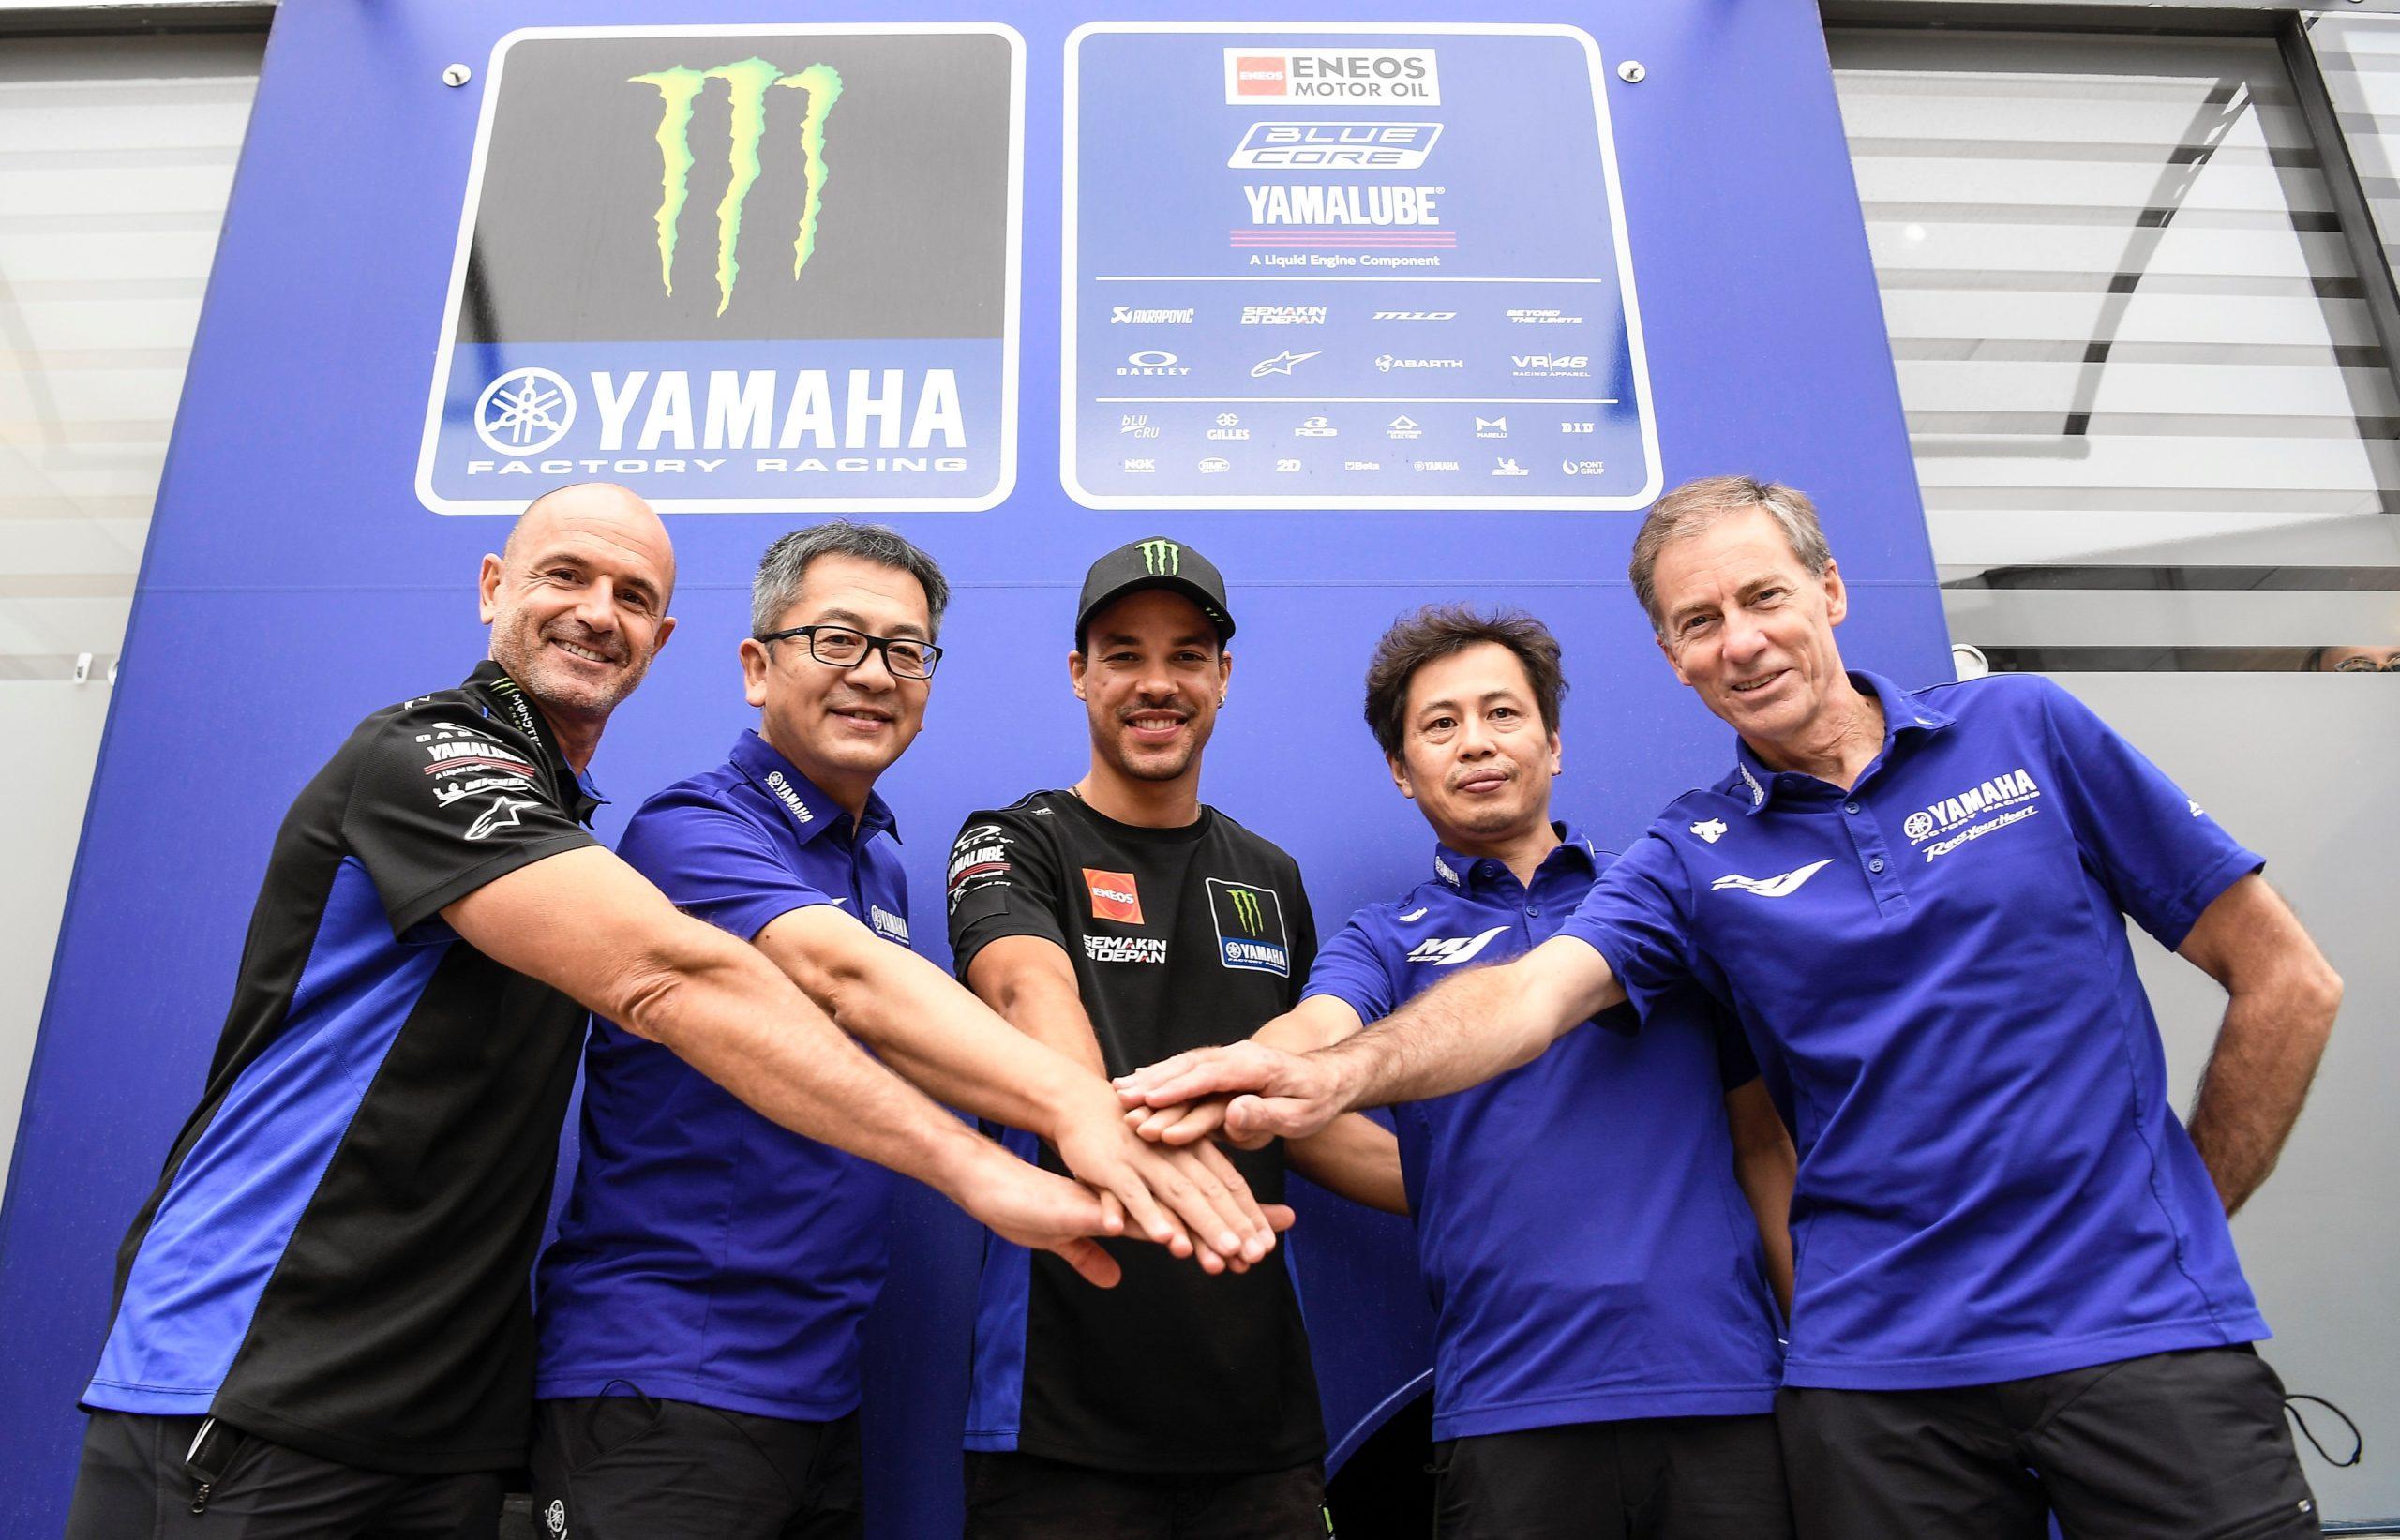 Franco Morbidelli sarà col team ufficiale Yamaha.